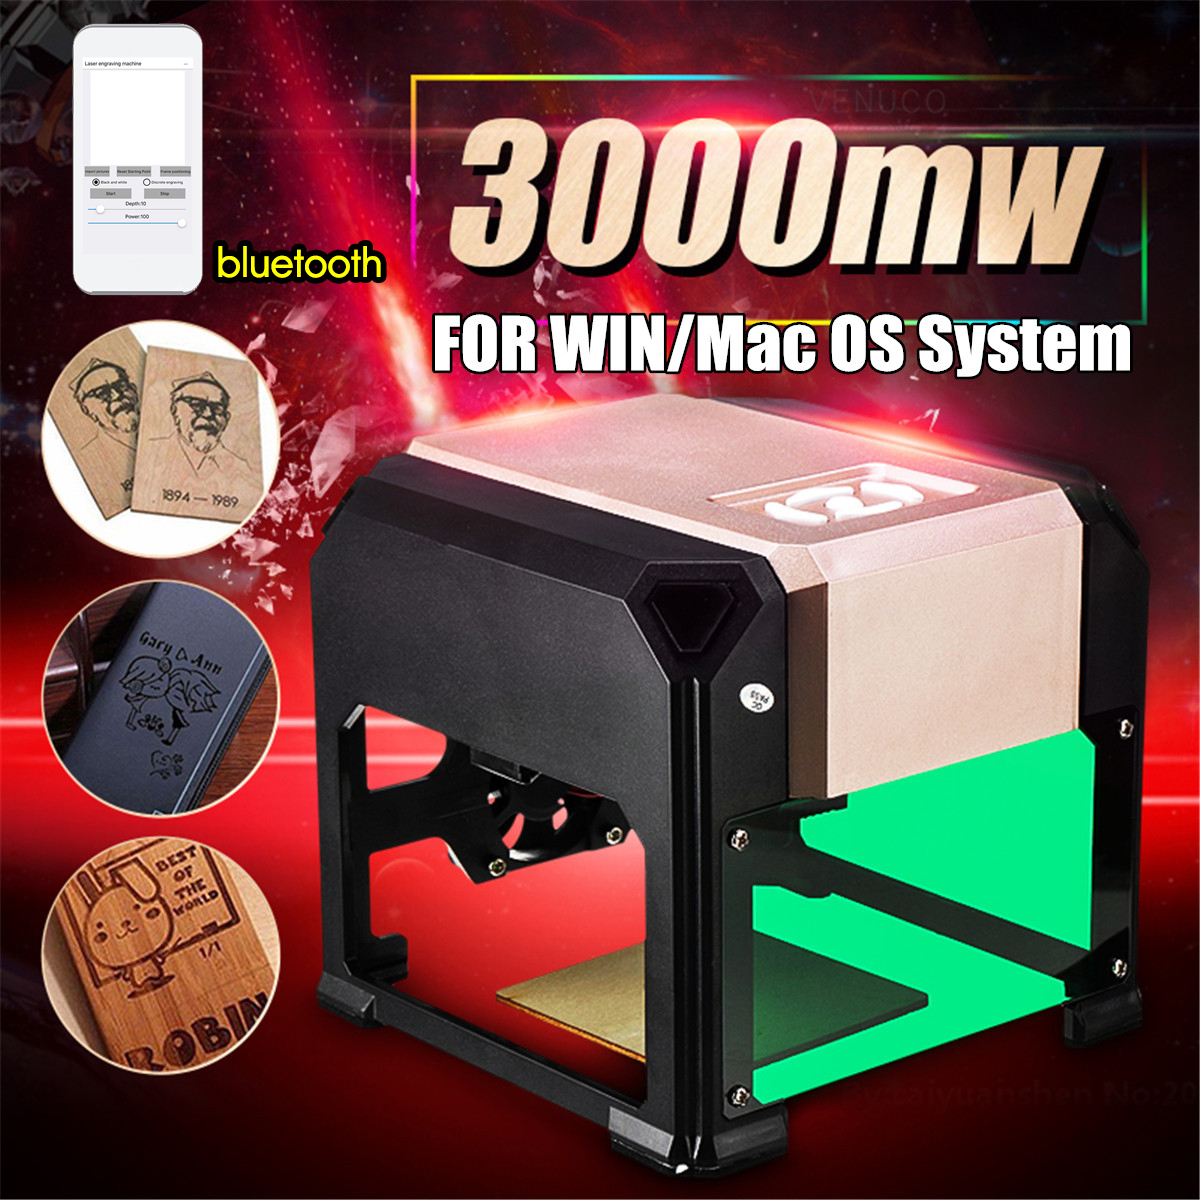 WOLIKE Upgrade Bluetooth Mini 3000MW Golden CNC Laser Engraving Machine AC 110-220V